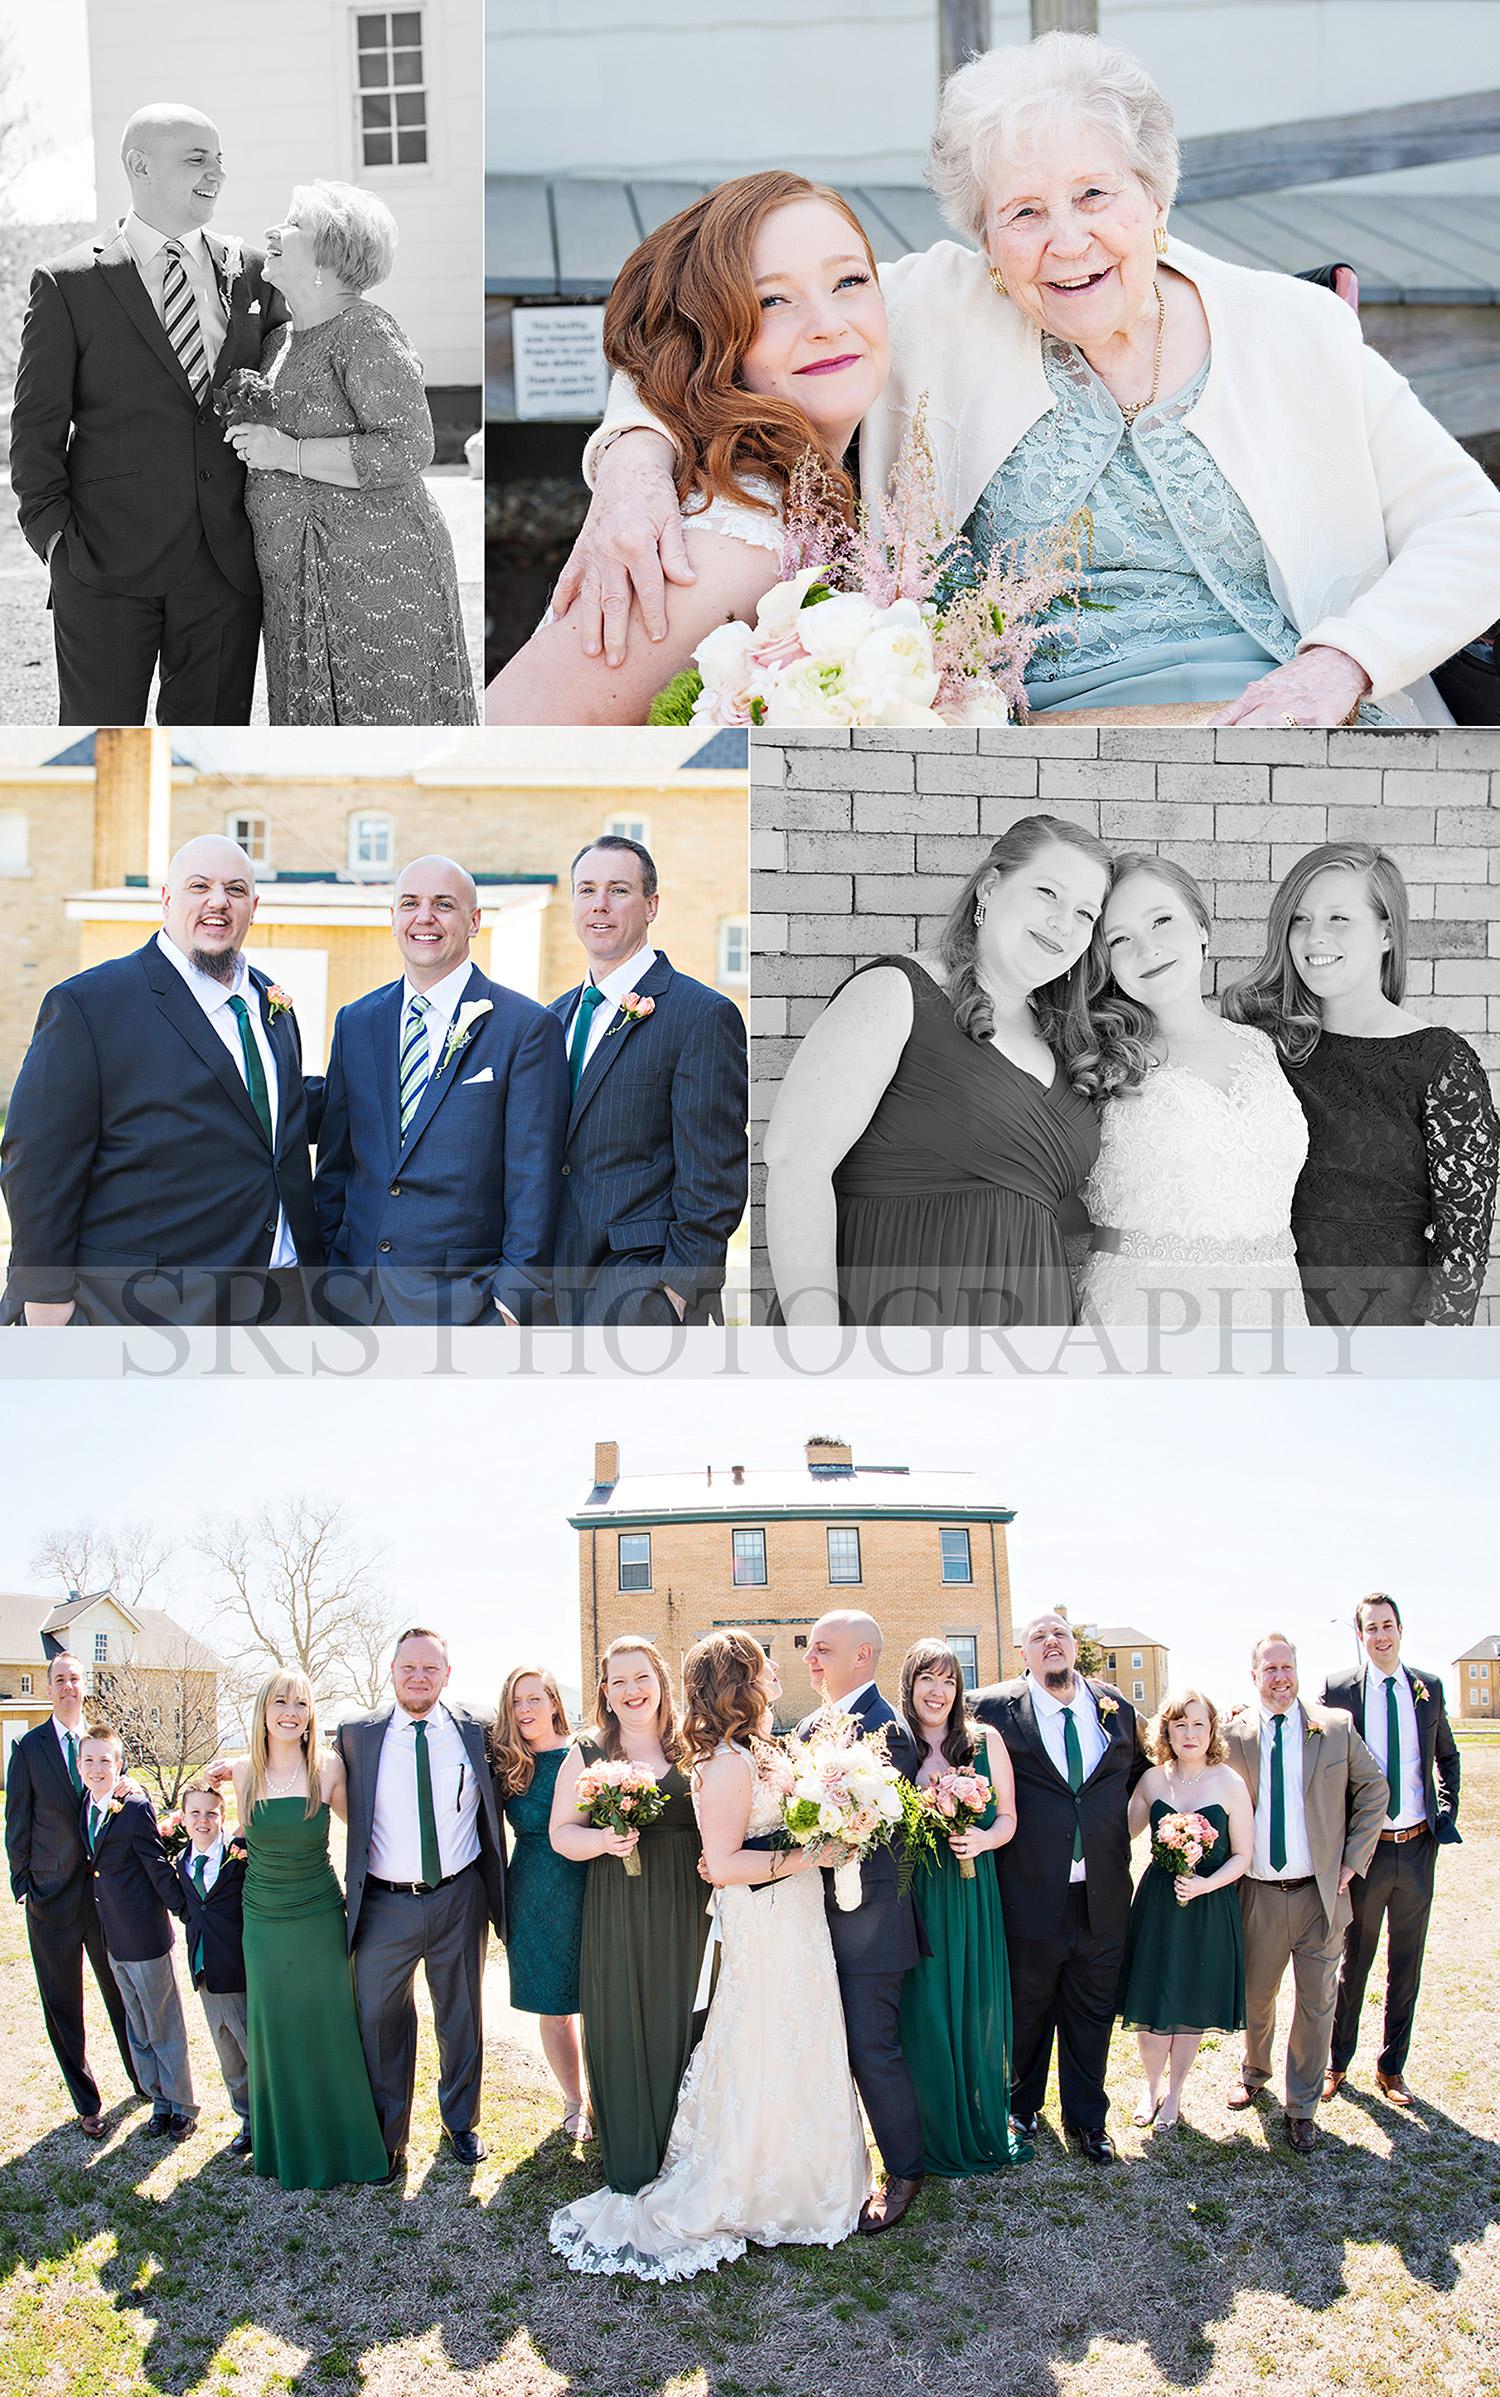 04_SRS_Photography_Sara_Stadtmiller_Asbury_Park_Wedding_Photography_NJ_Wedding_Photographer_Monmouth_County_Wedding_Photographer_Home_Wedding_Sandy_Hook_Weddin_Chapel